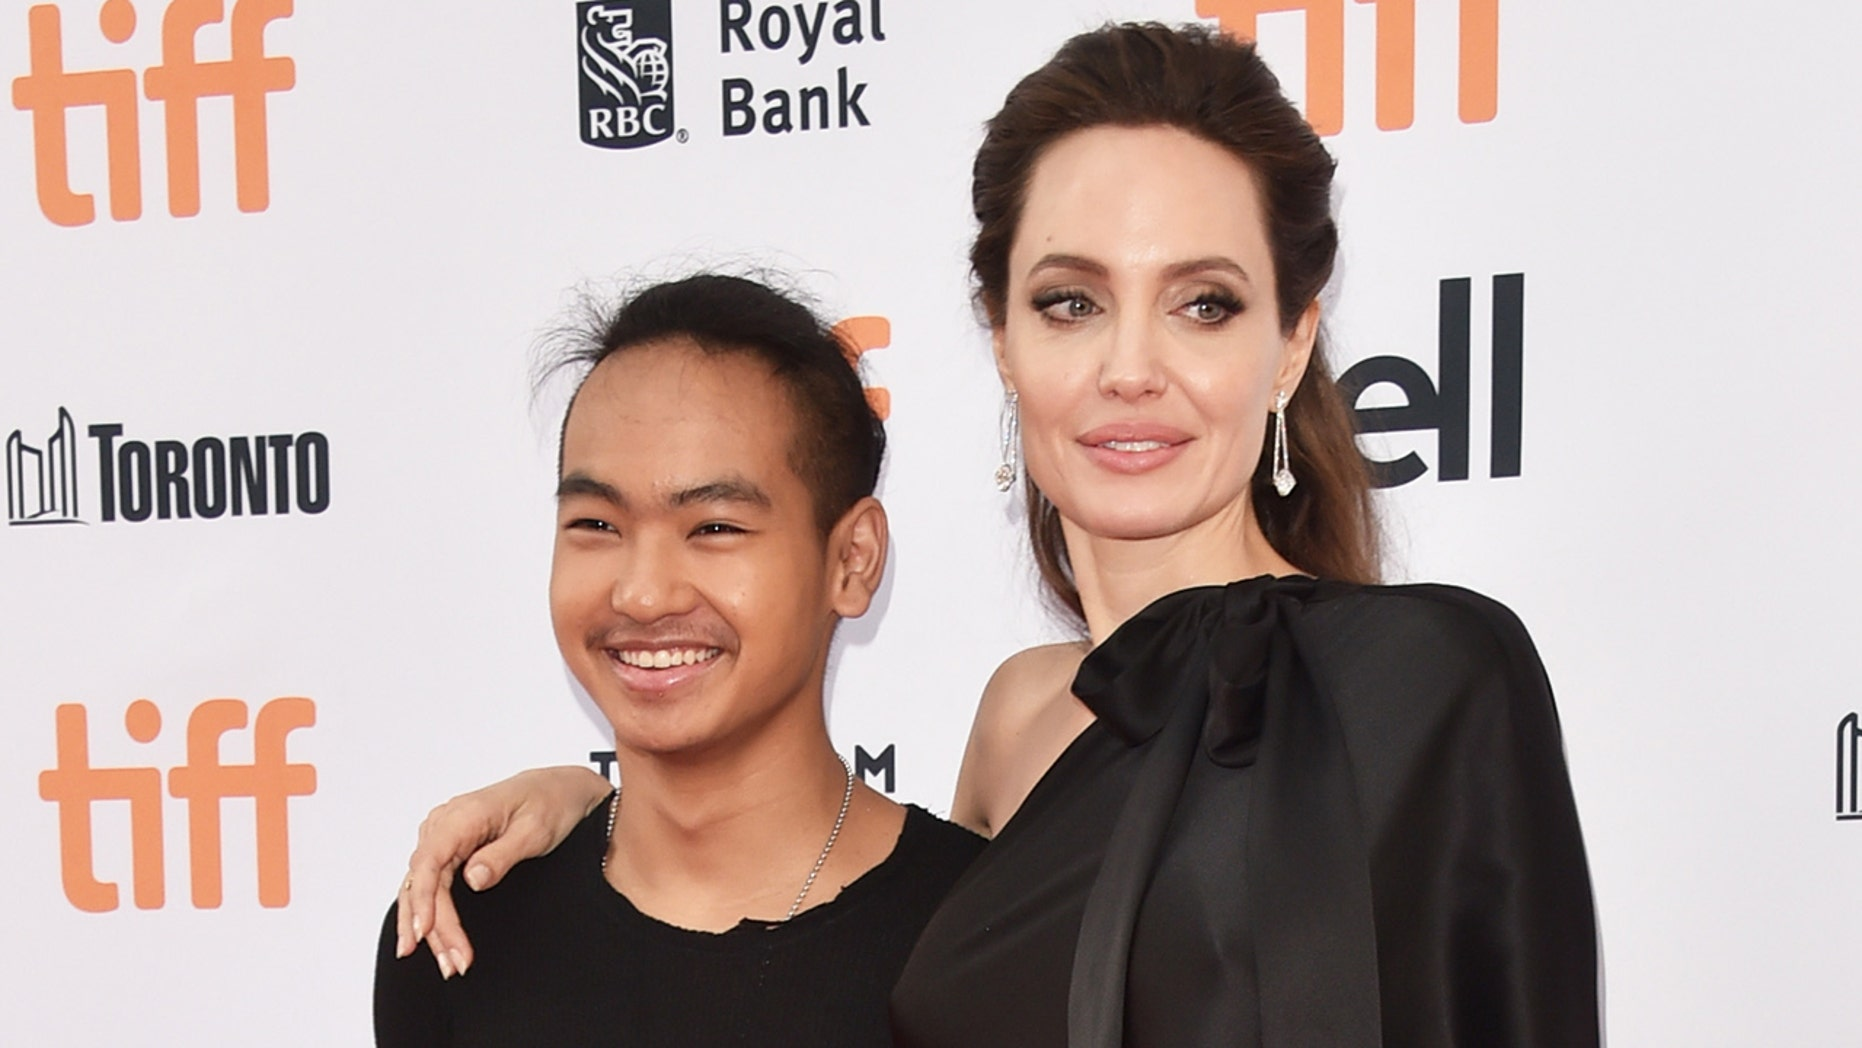 Angelina Jolie and her son Maddox Jolie-Pitt (L).